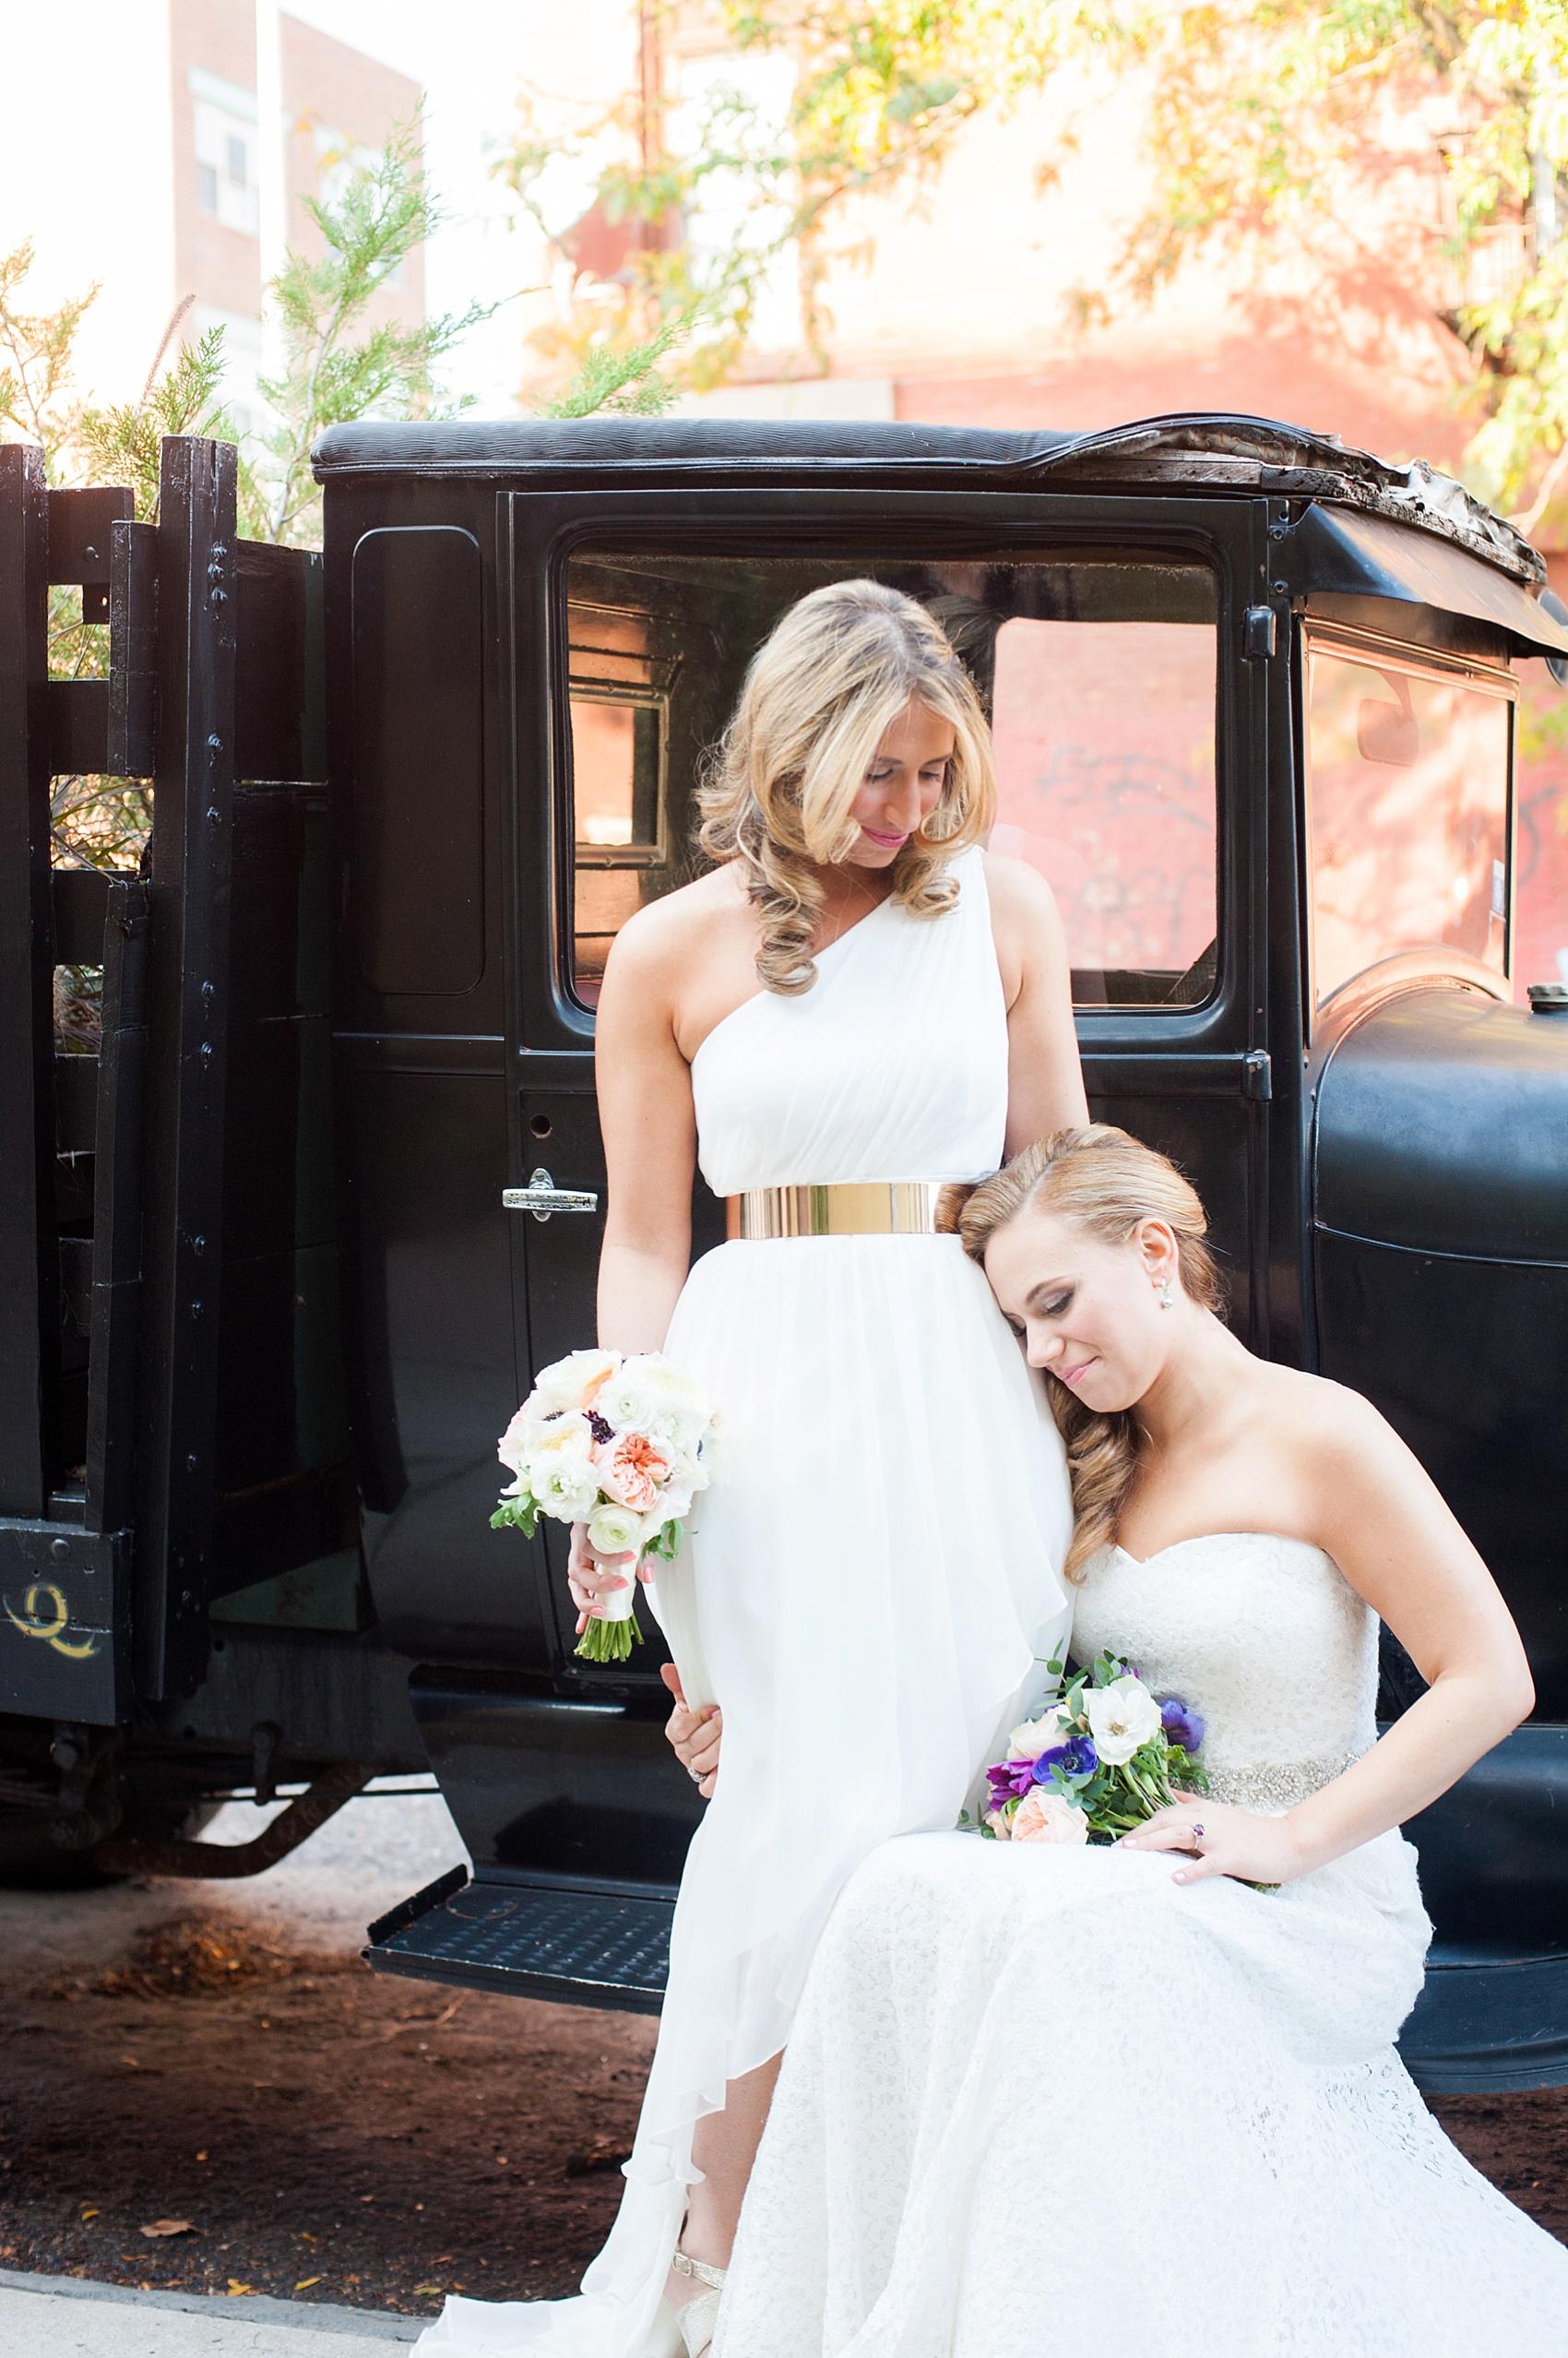 mikkelpaige-photography-501_union-gay_wedding-allie_dayna_0020.jpg